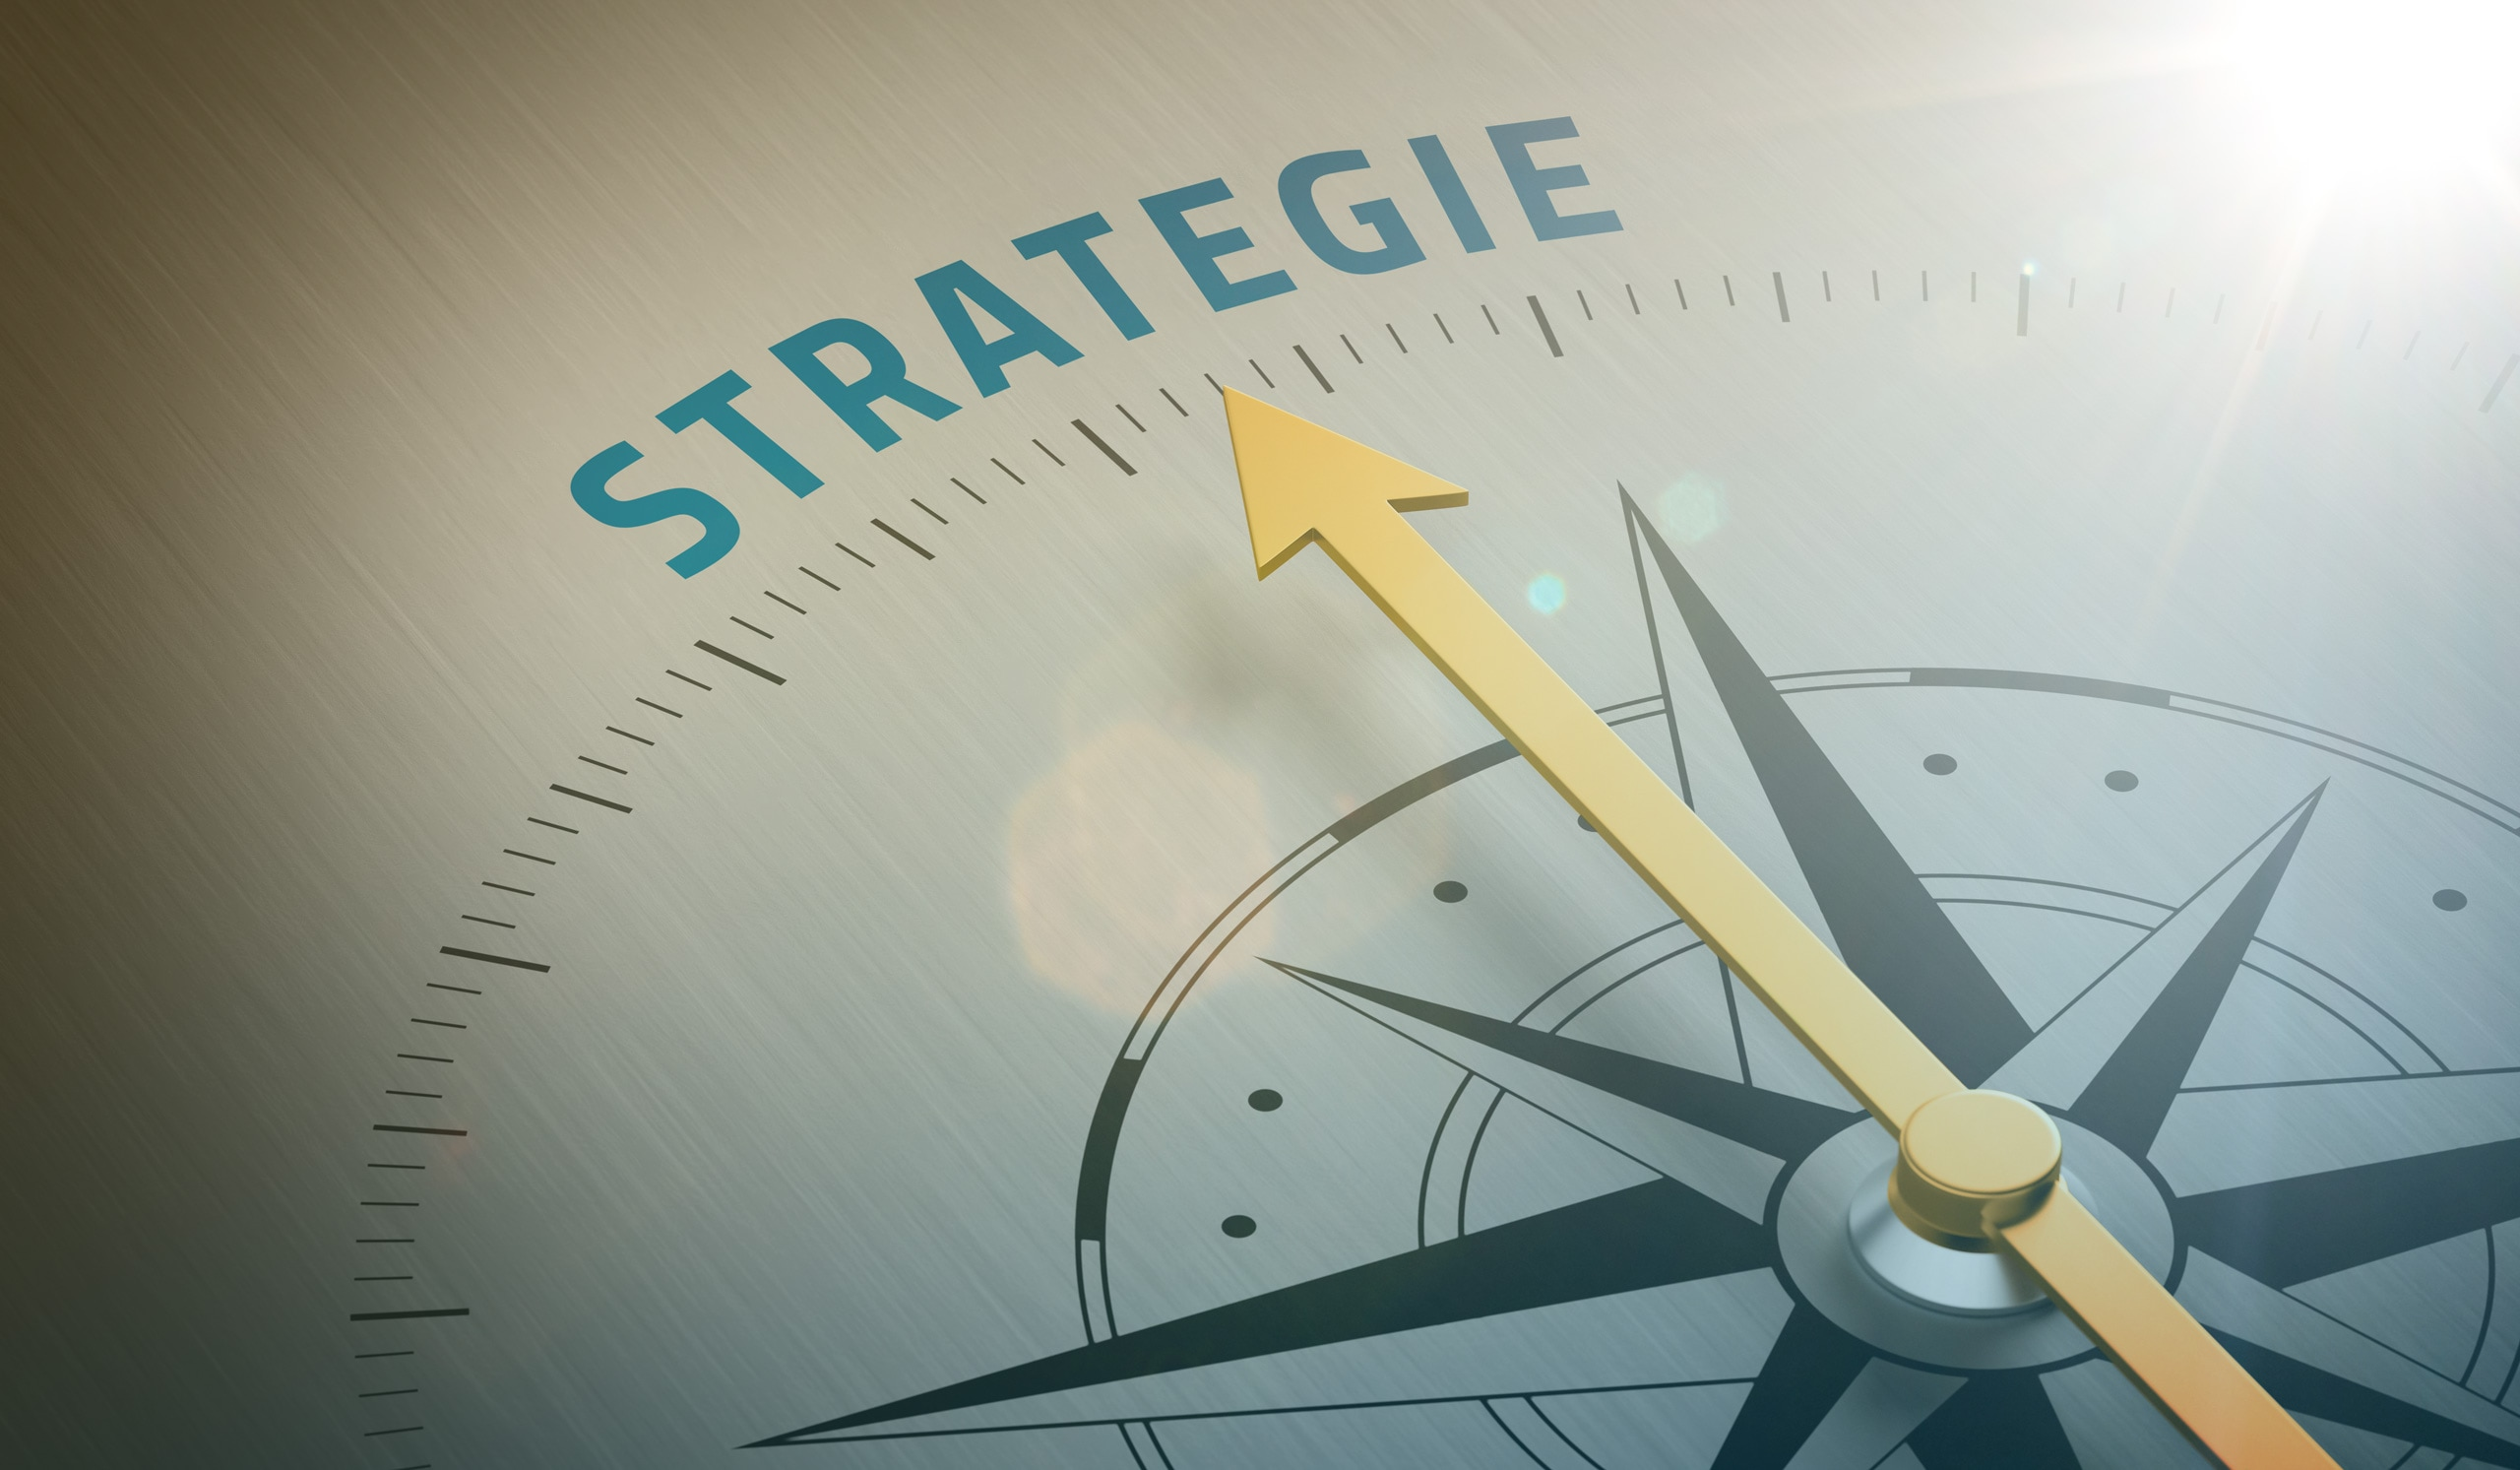 nordmarke-KeyVisual-Strategie